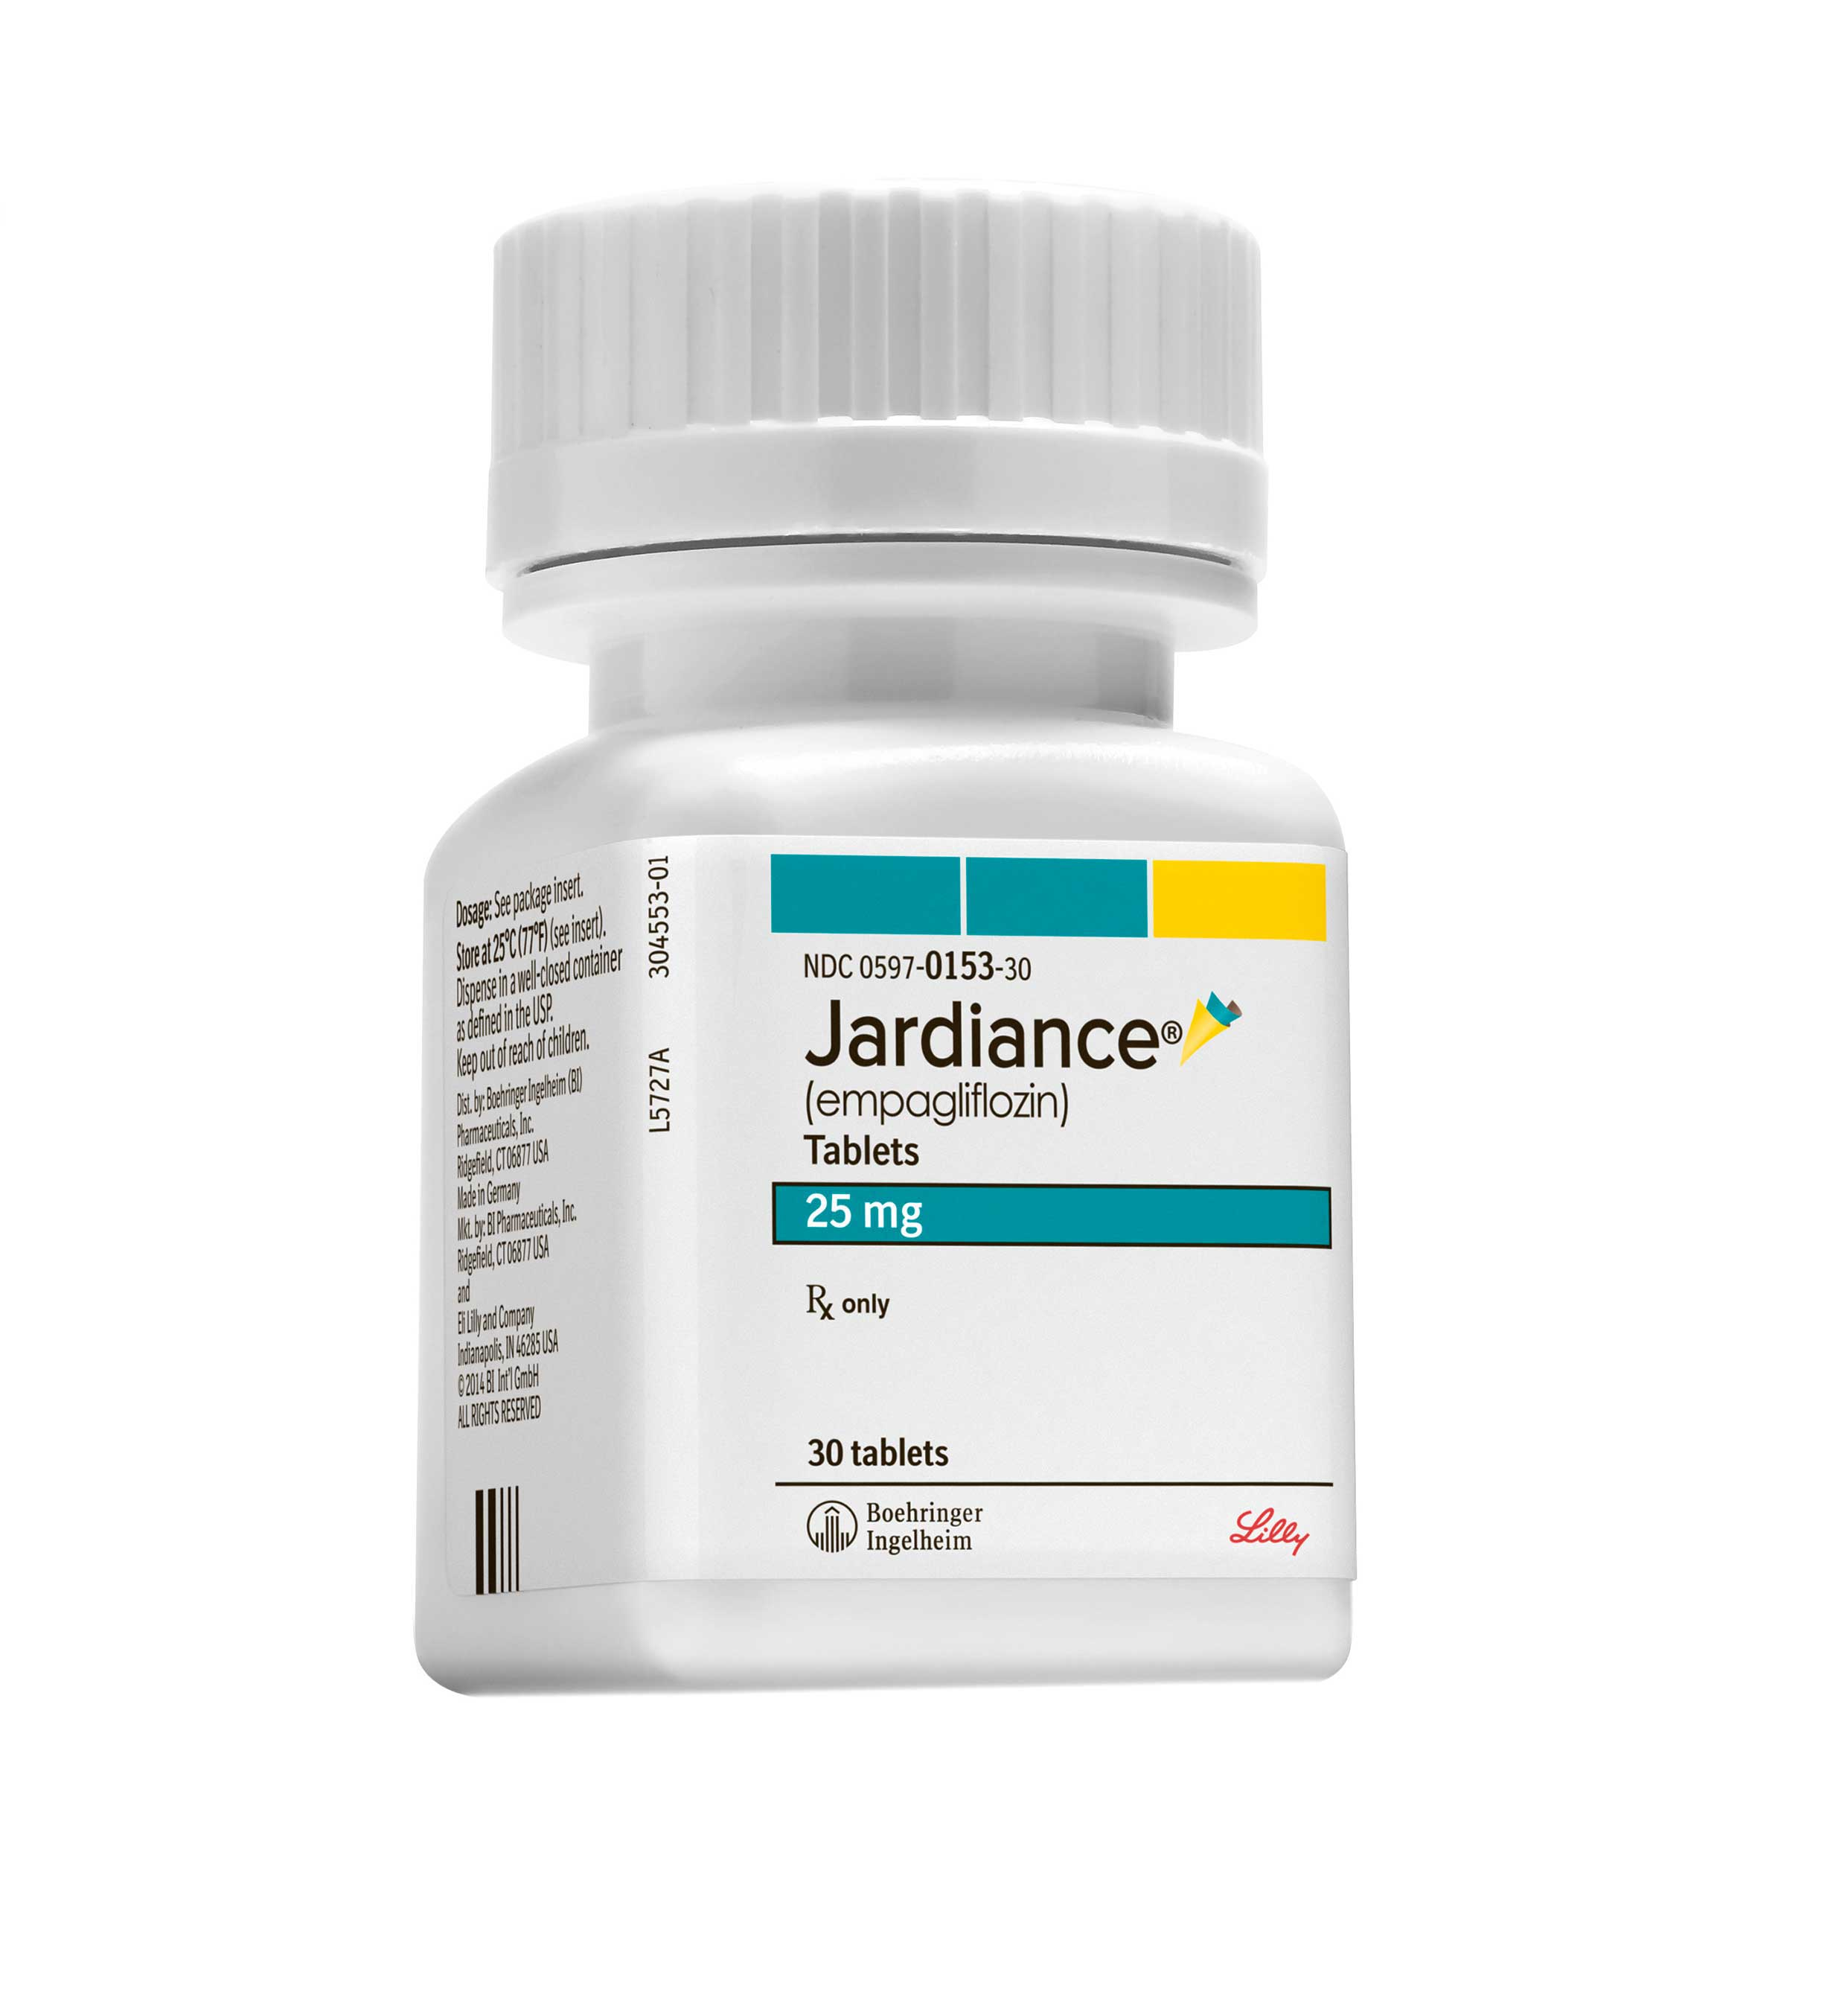 u s  fda approves jardiance u00ae  empagliflozin  tablets to reduce the risk of cardiovascular death